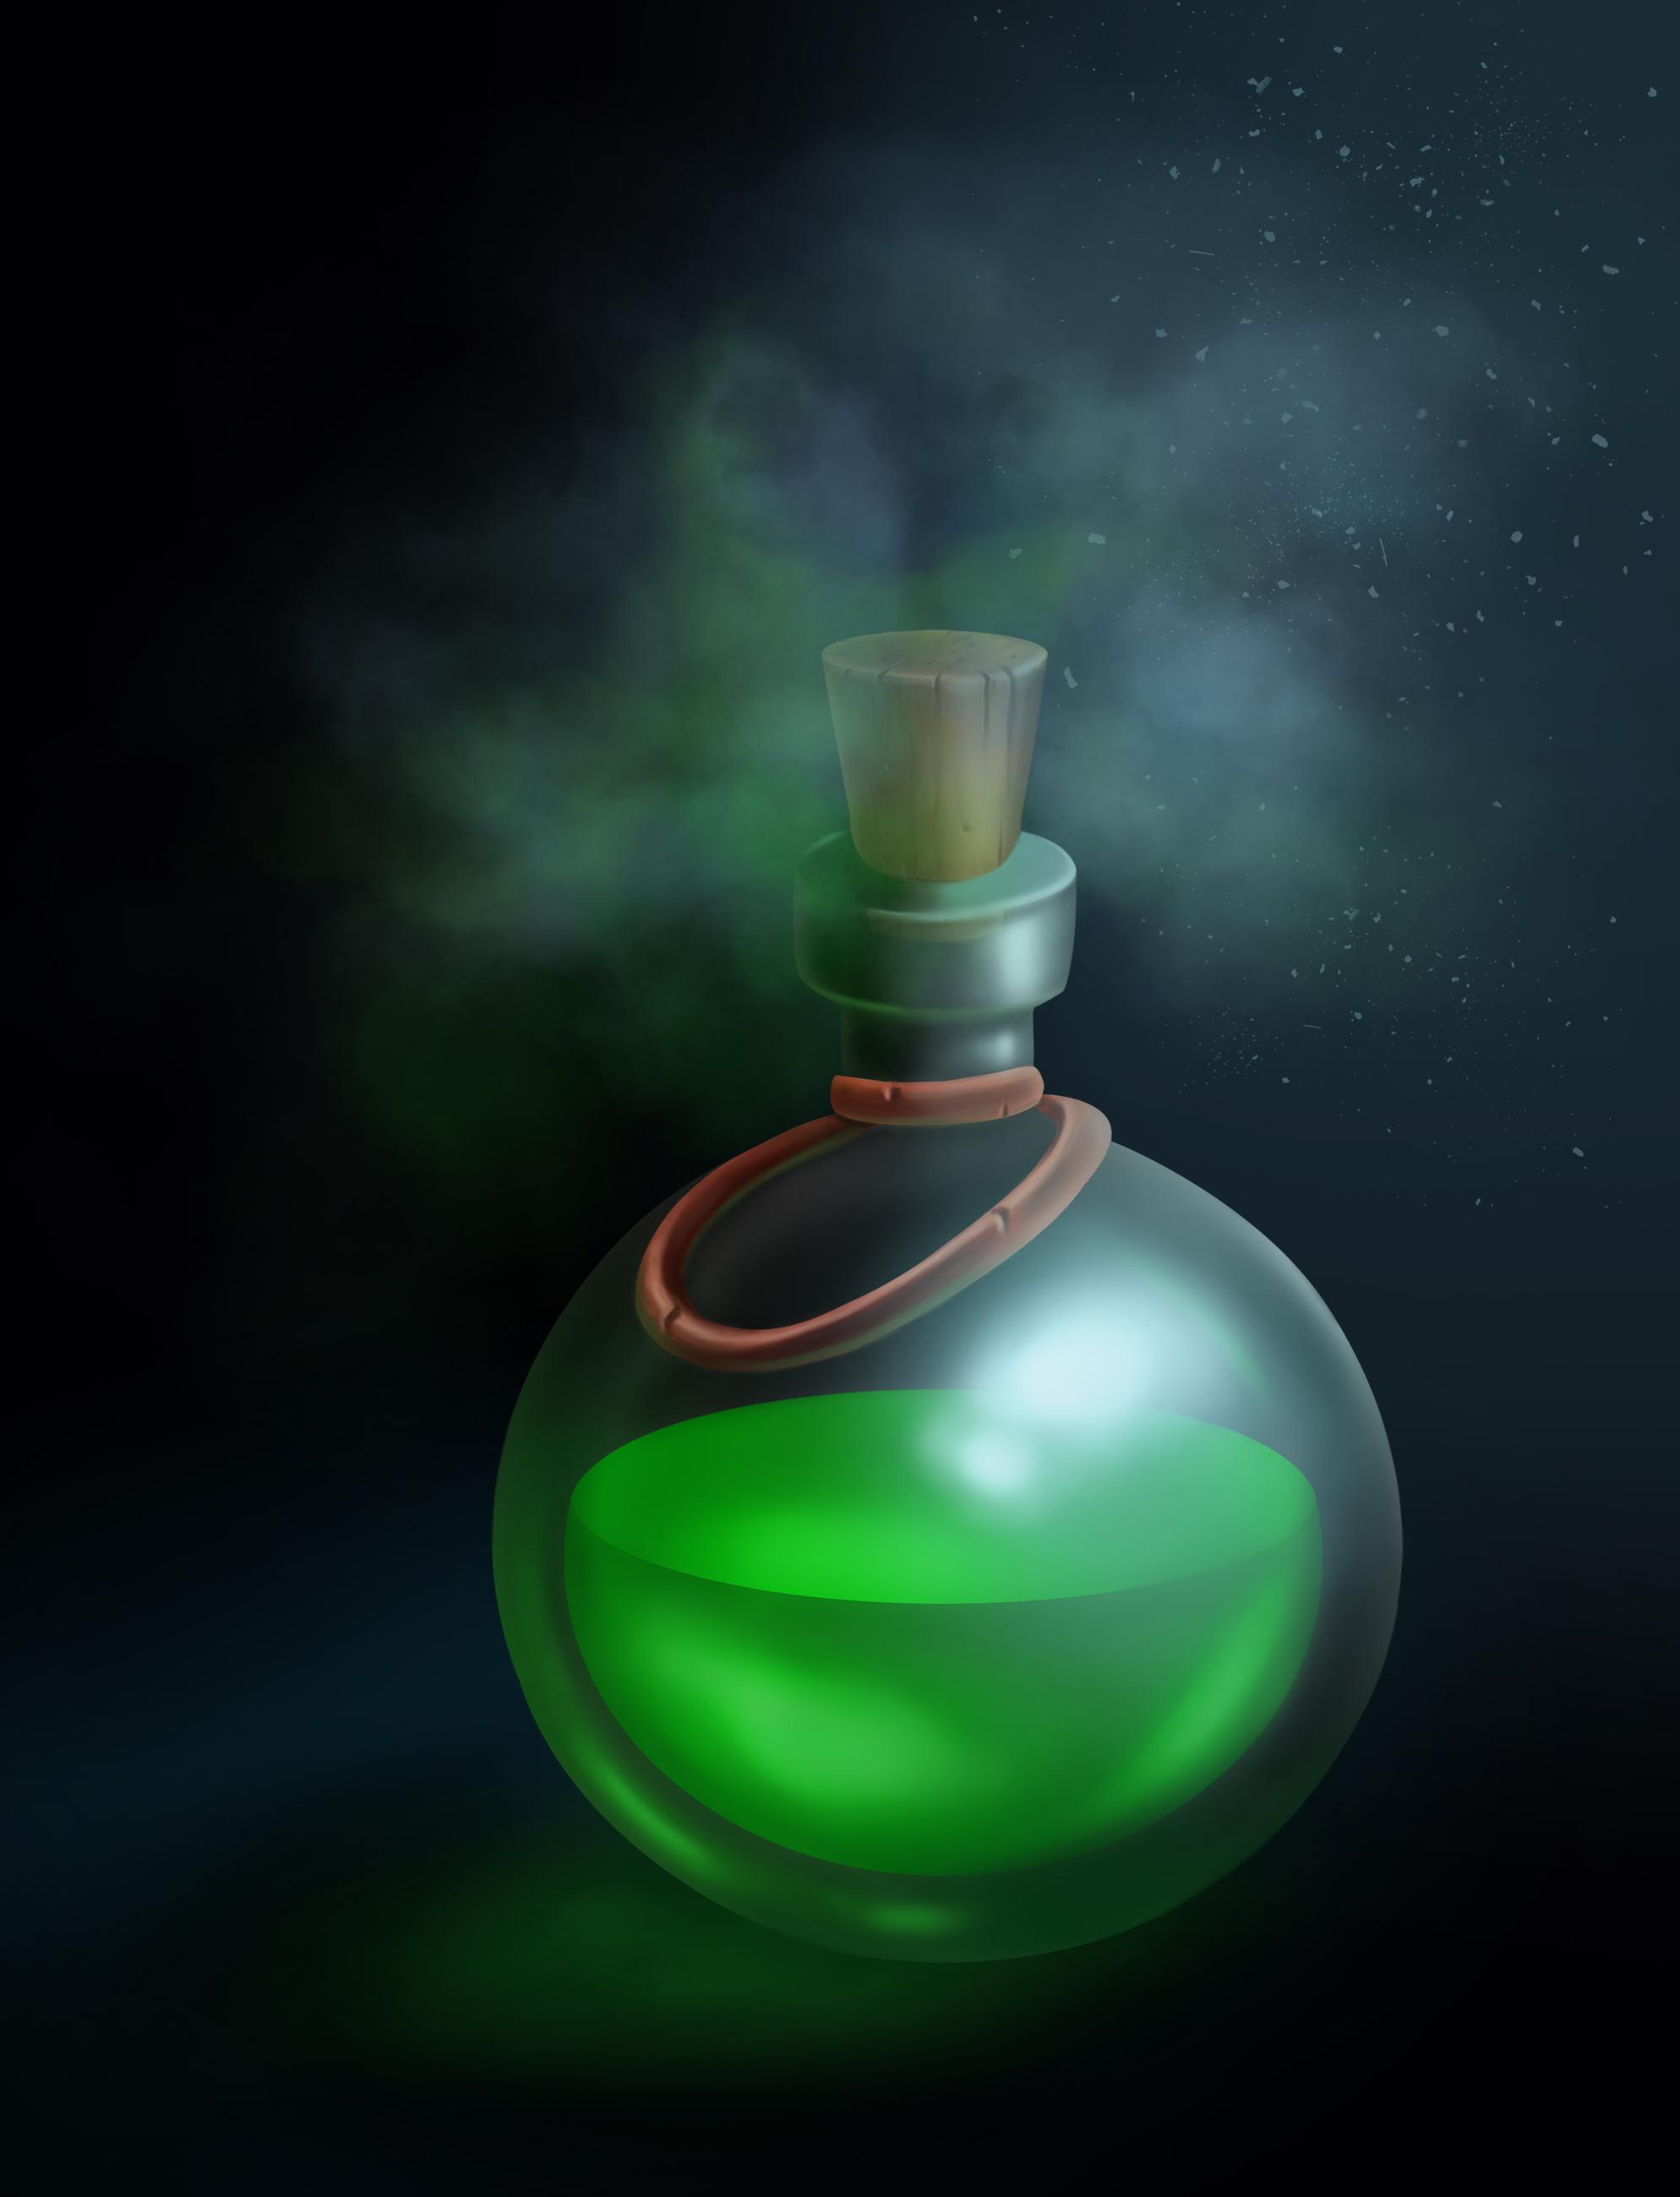 flask2   2D Casual ,Environment concept art, очень нужна оценка и мнение